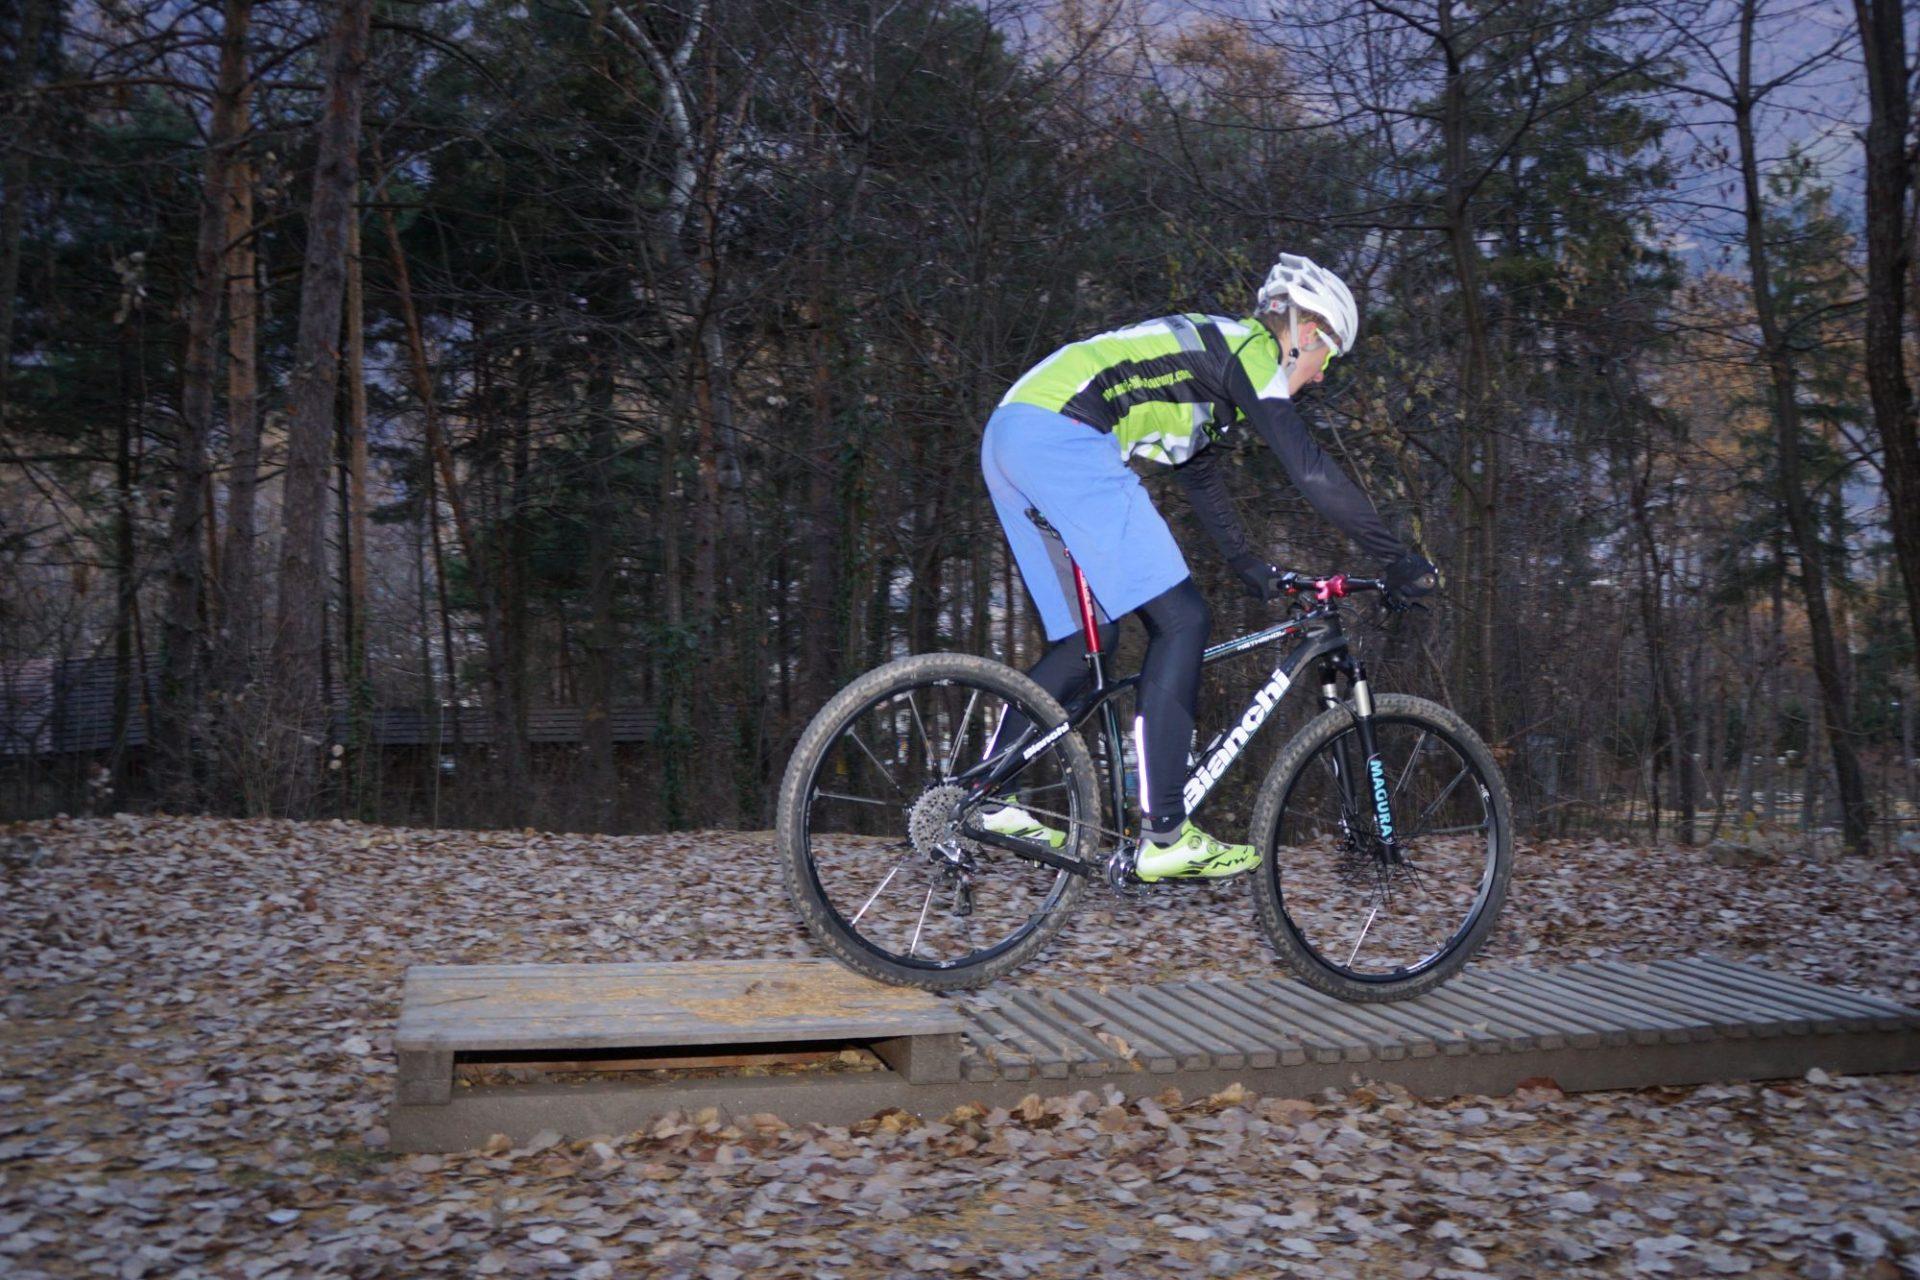 Bergsteigertipp MTB Hindernis 05 I (c) OetziBikeAcqademy